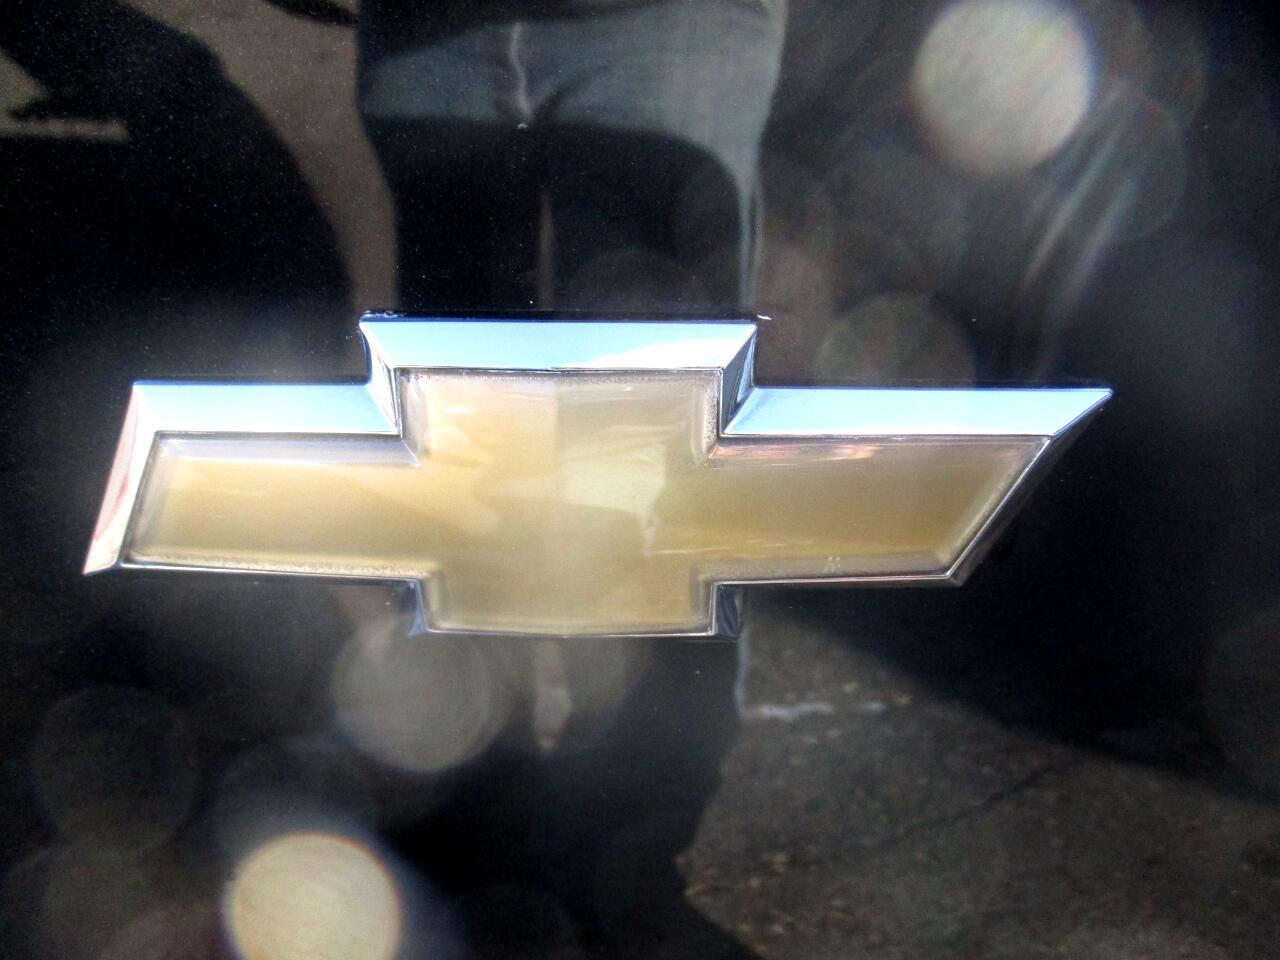 2010 Chevrolet Malibu 4dr Sdn LT w/2LT